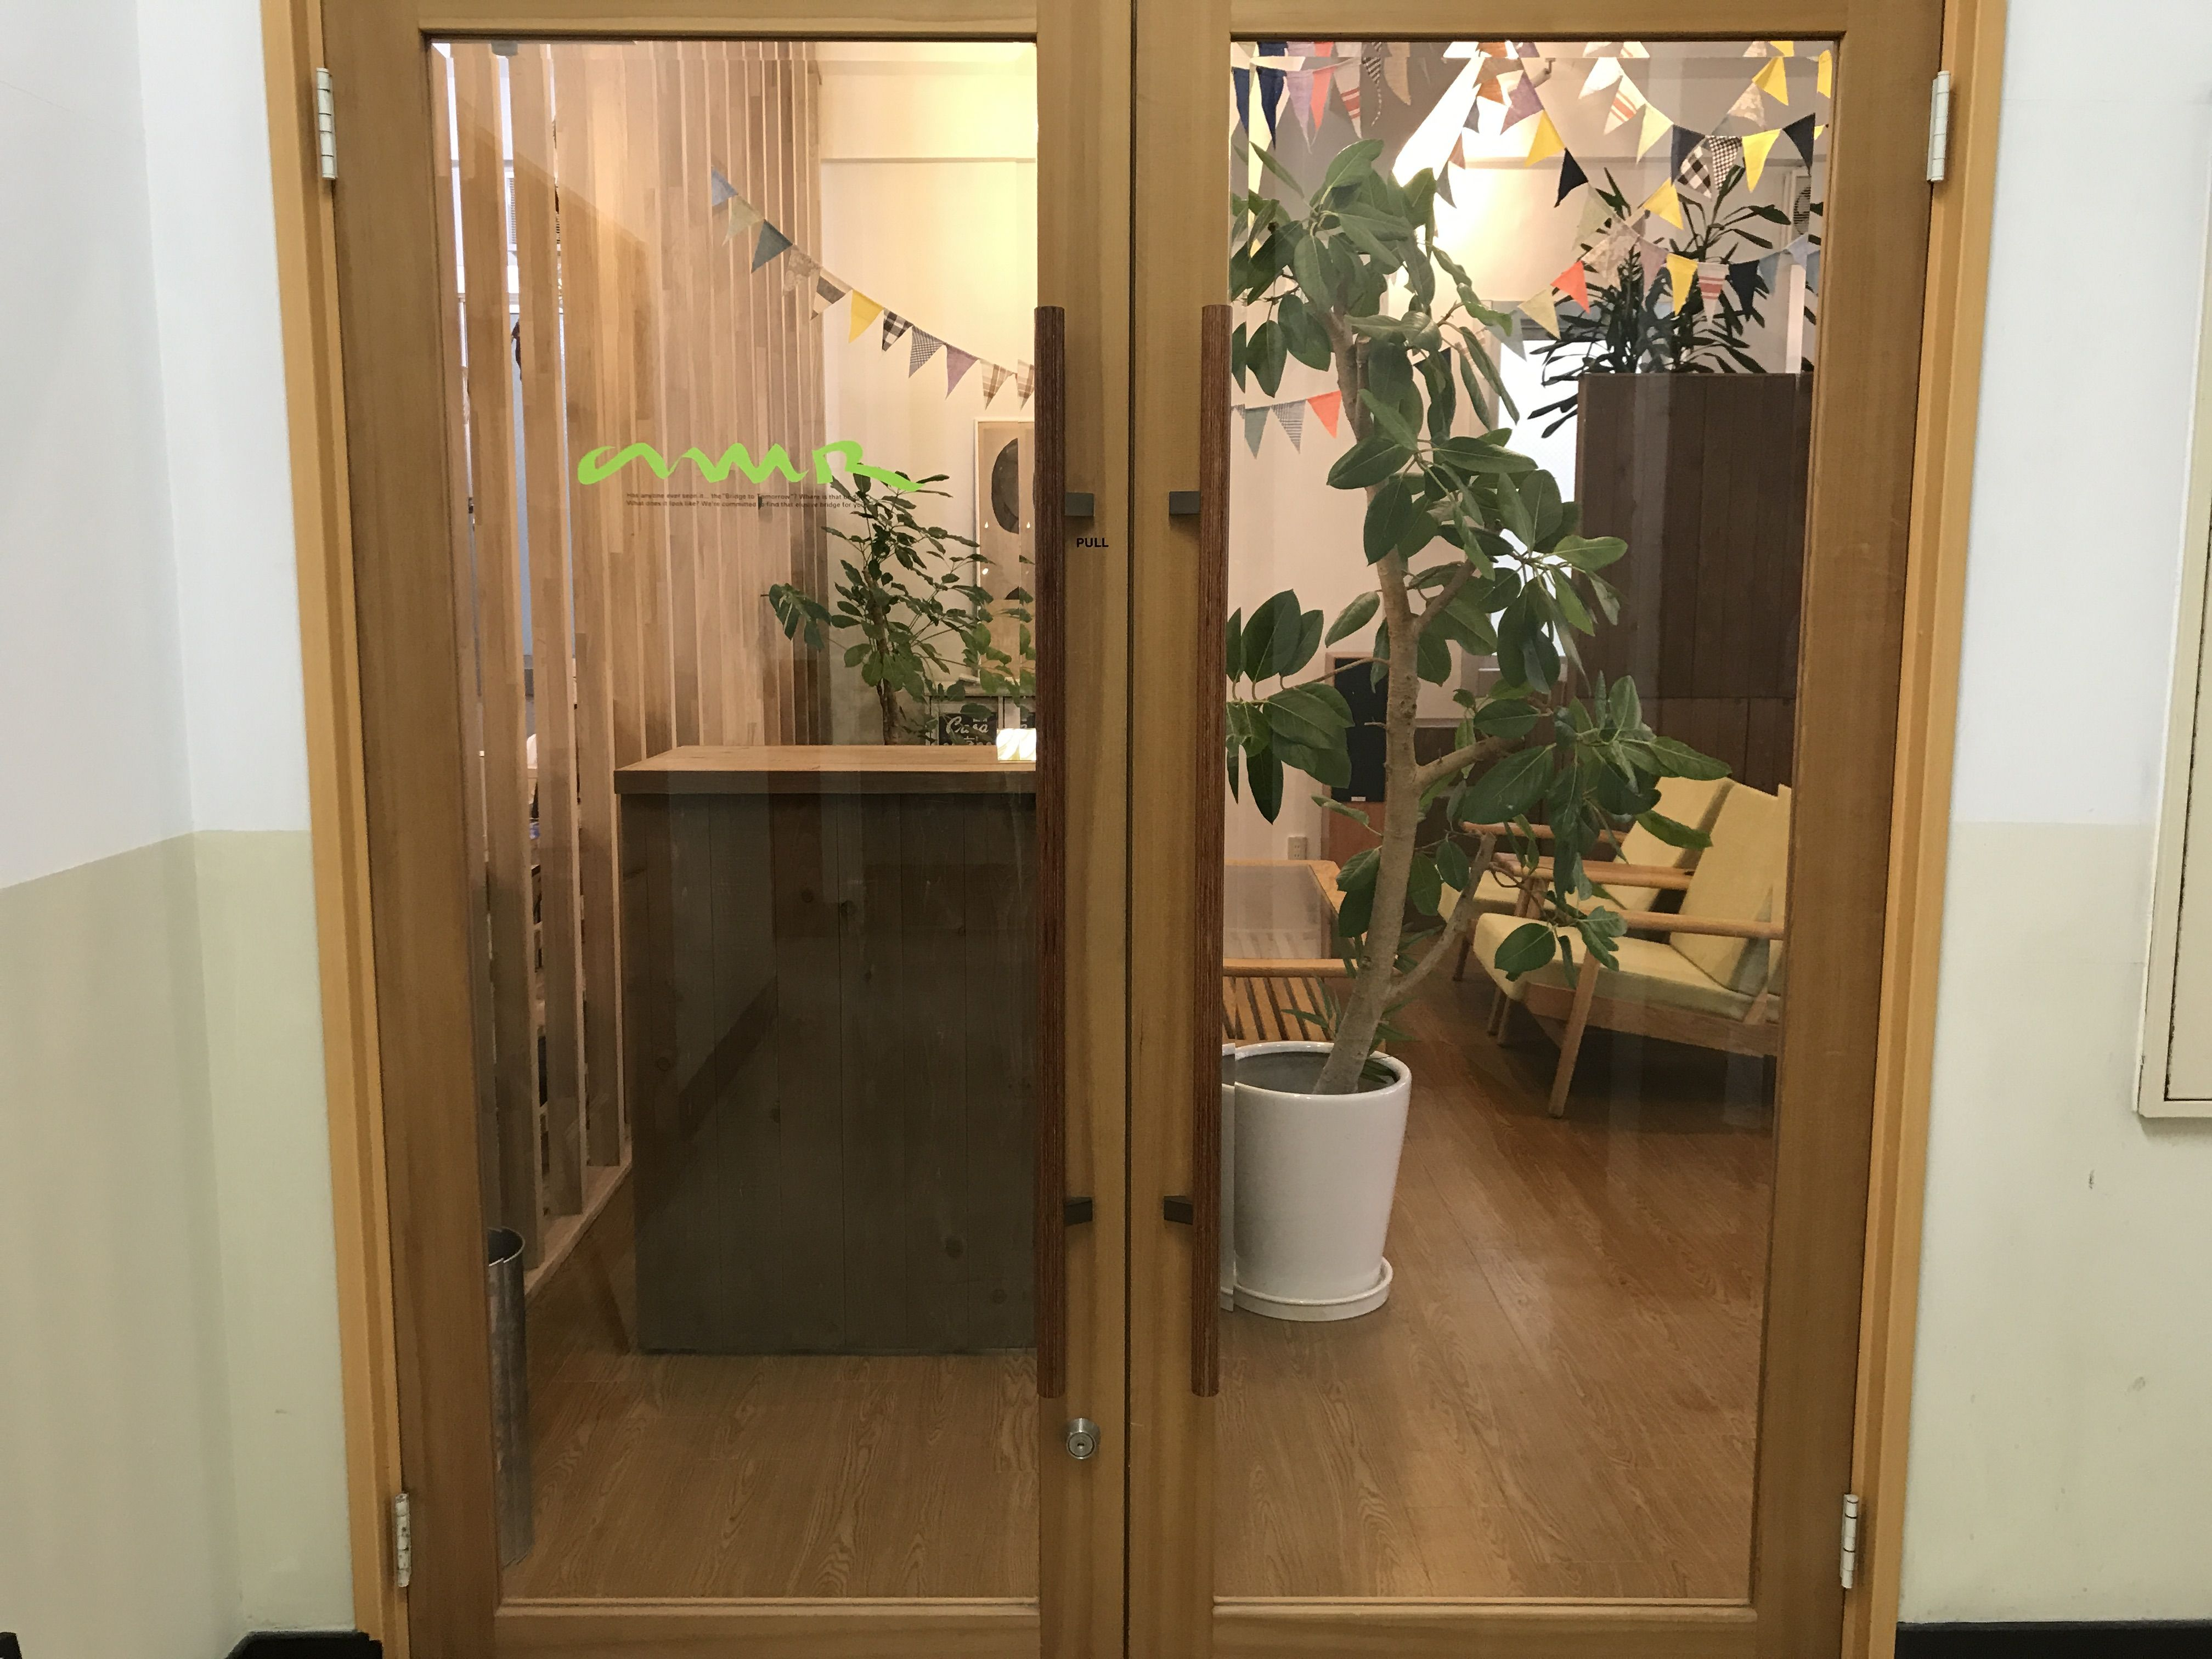 4mのDJブースがあるオフィスの入り口